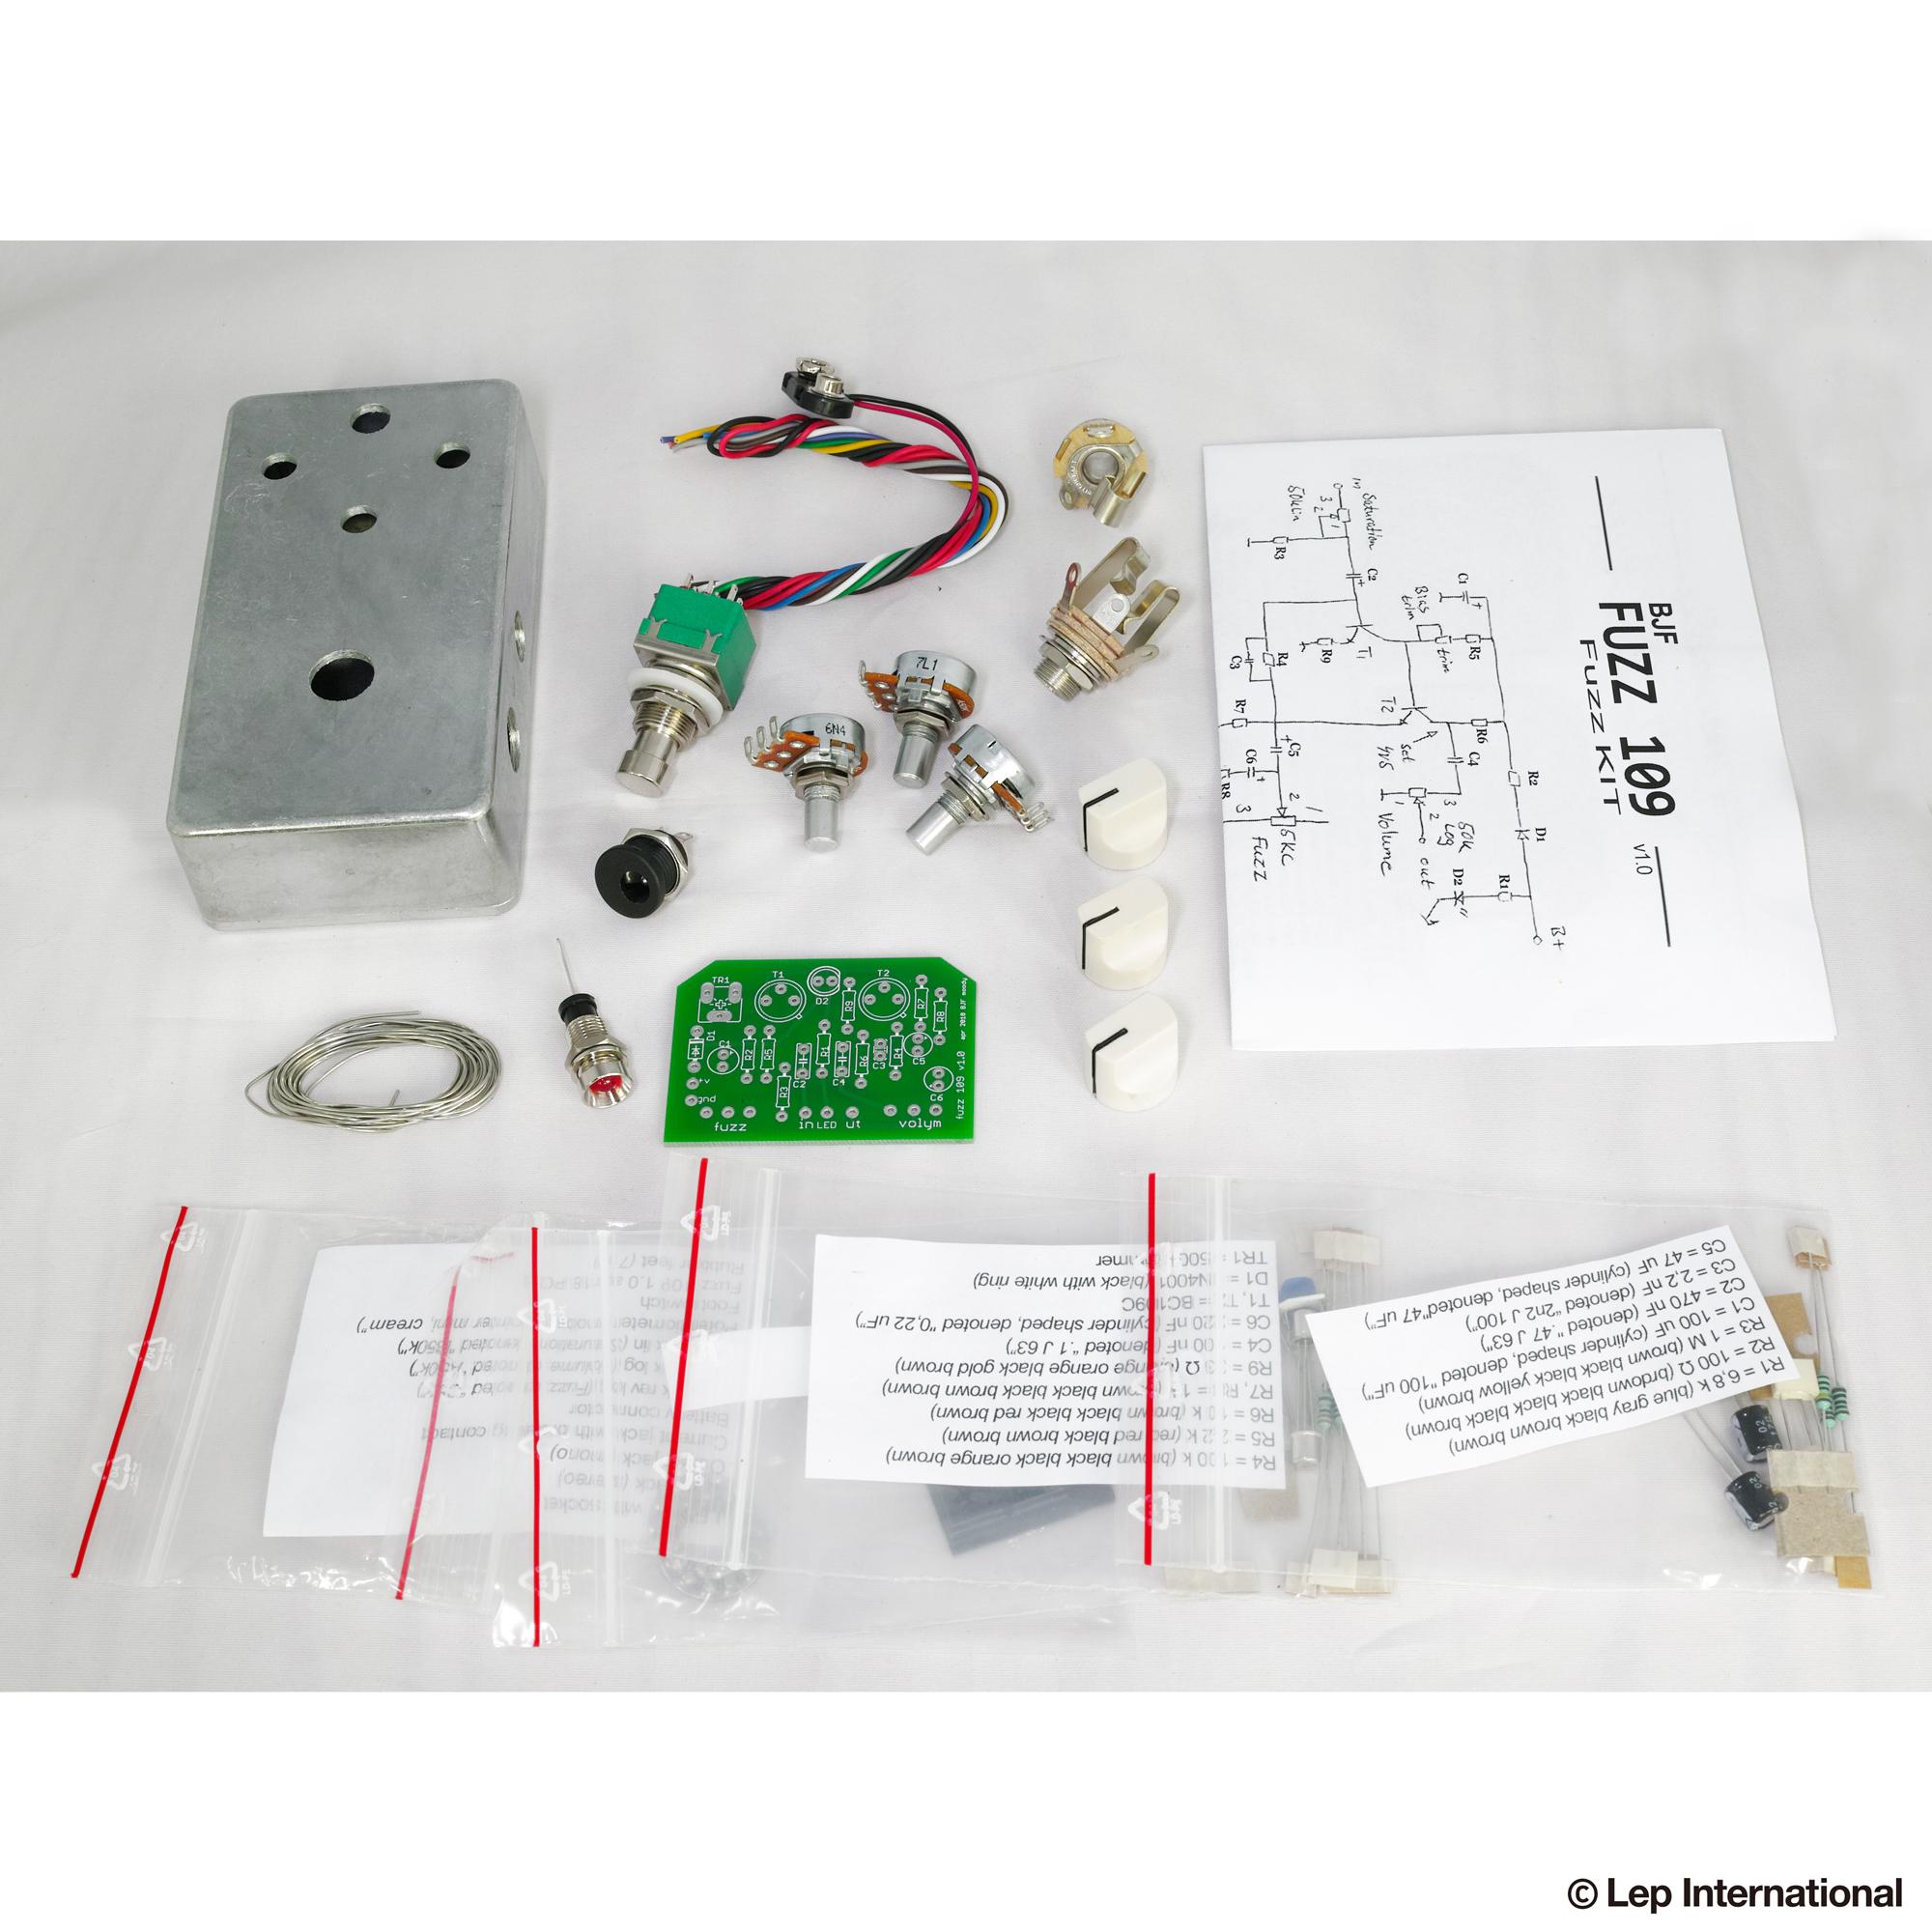 Fuzz-109-Fuzz-Kit-01.jpg